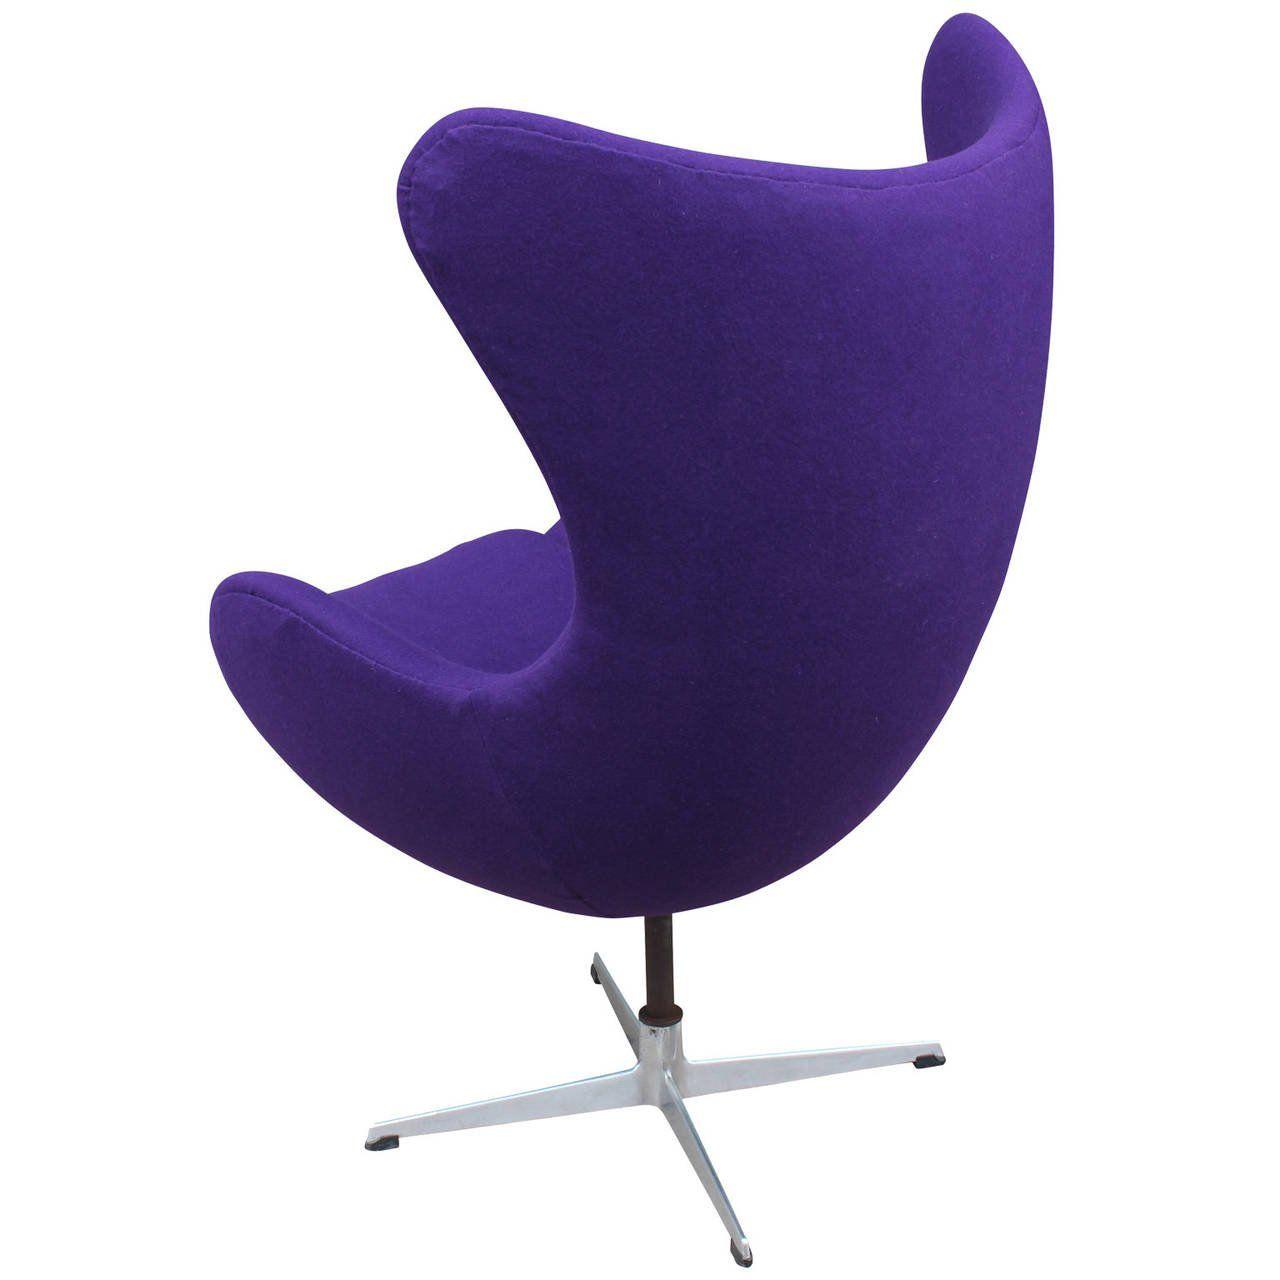 Arne Jacobson Egg Chair In Royal Purple 3